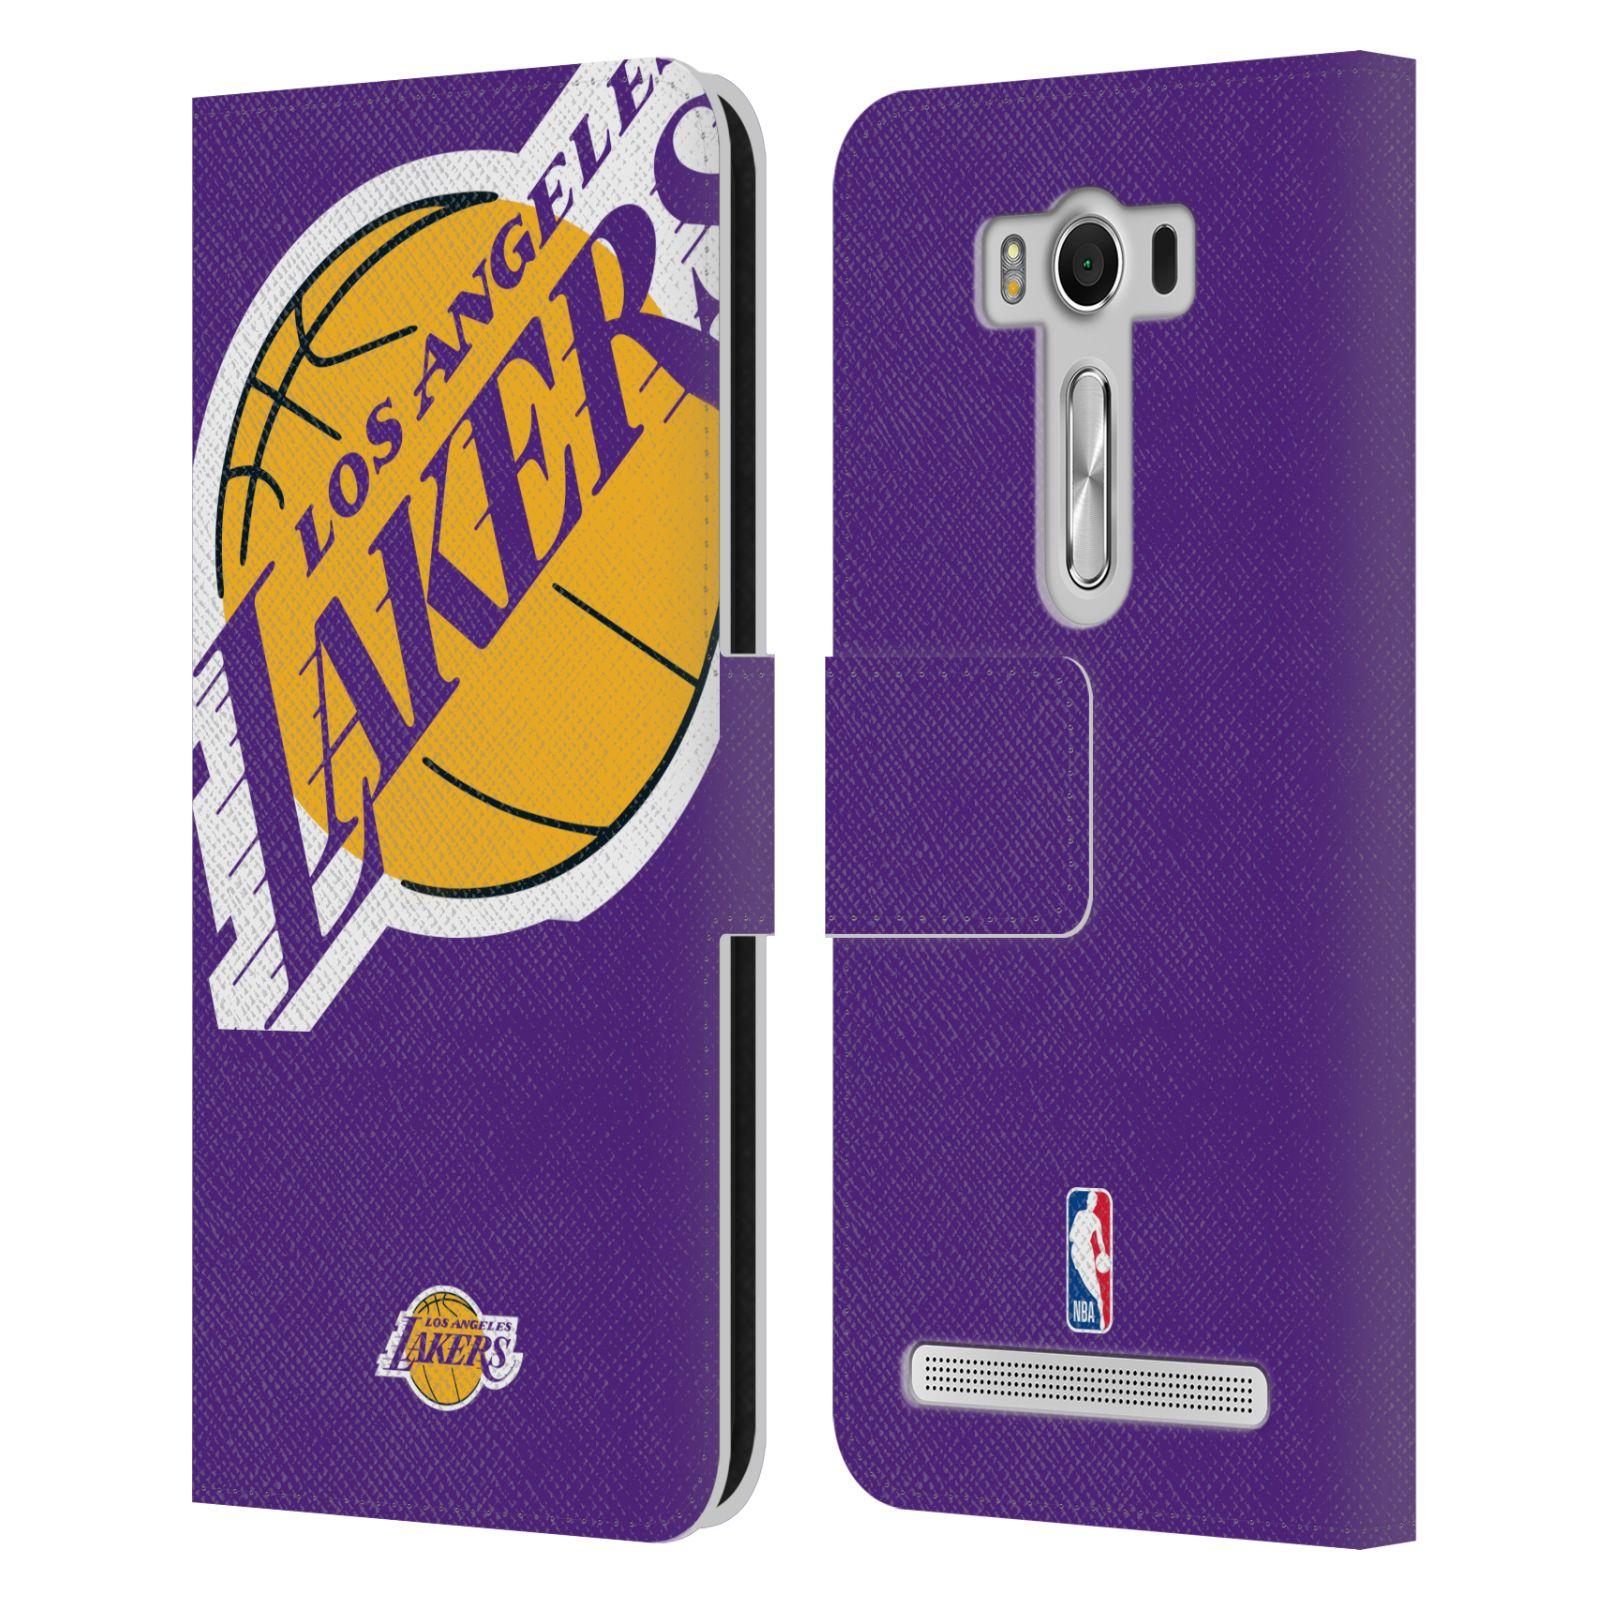 Pouzdro na mobil Asus Zenfone 2 Laser ZE500KL - Head Case - NBA - Los Angeles Lakers velký znak